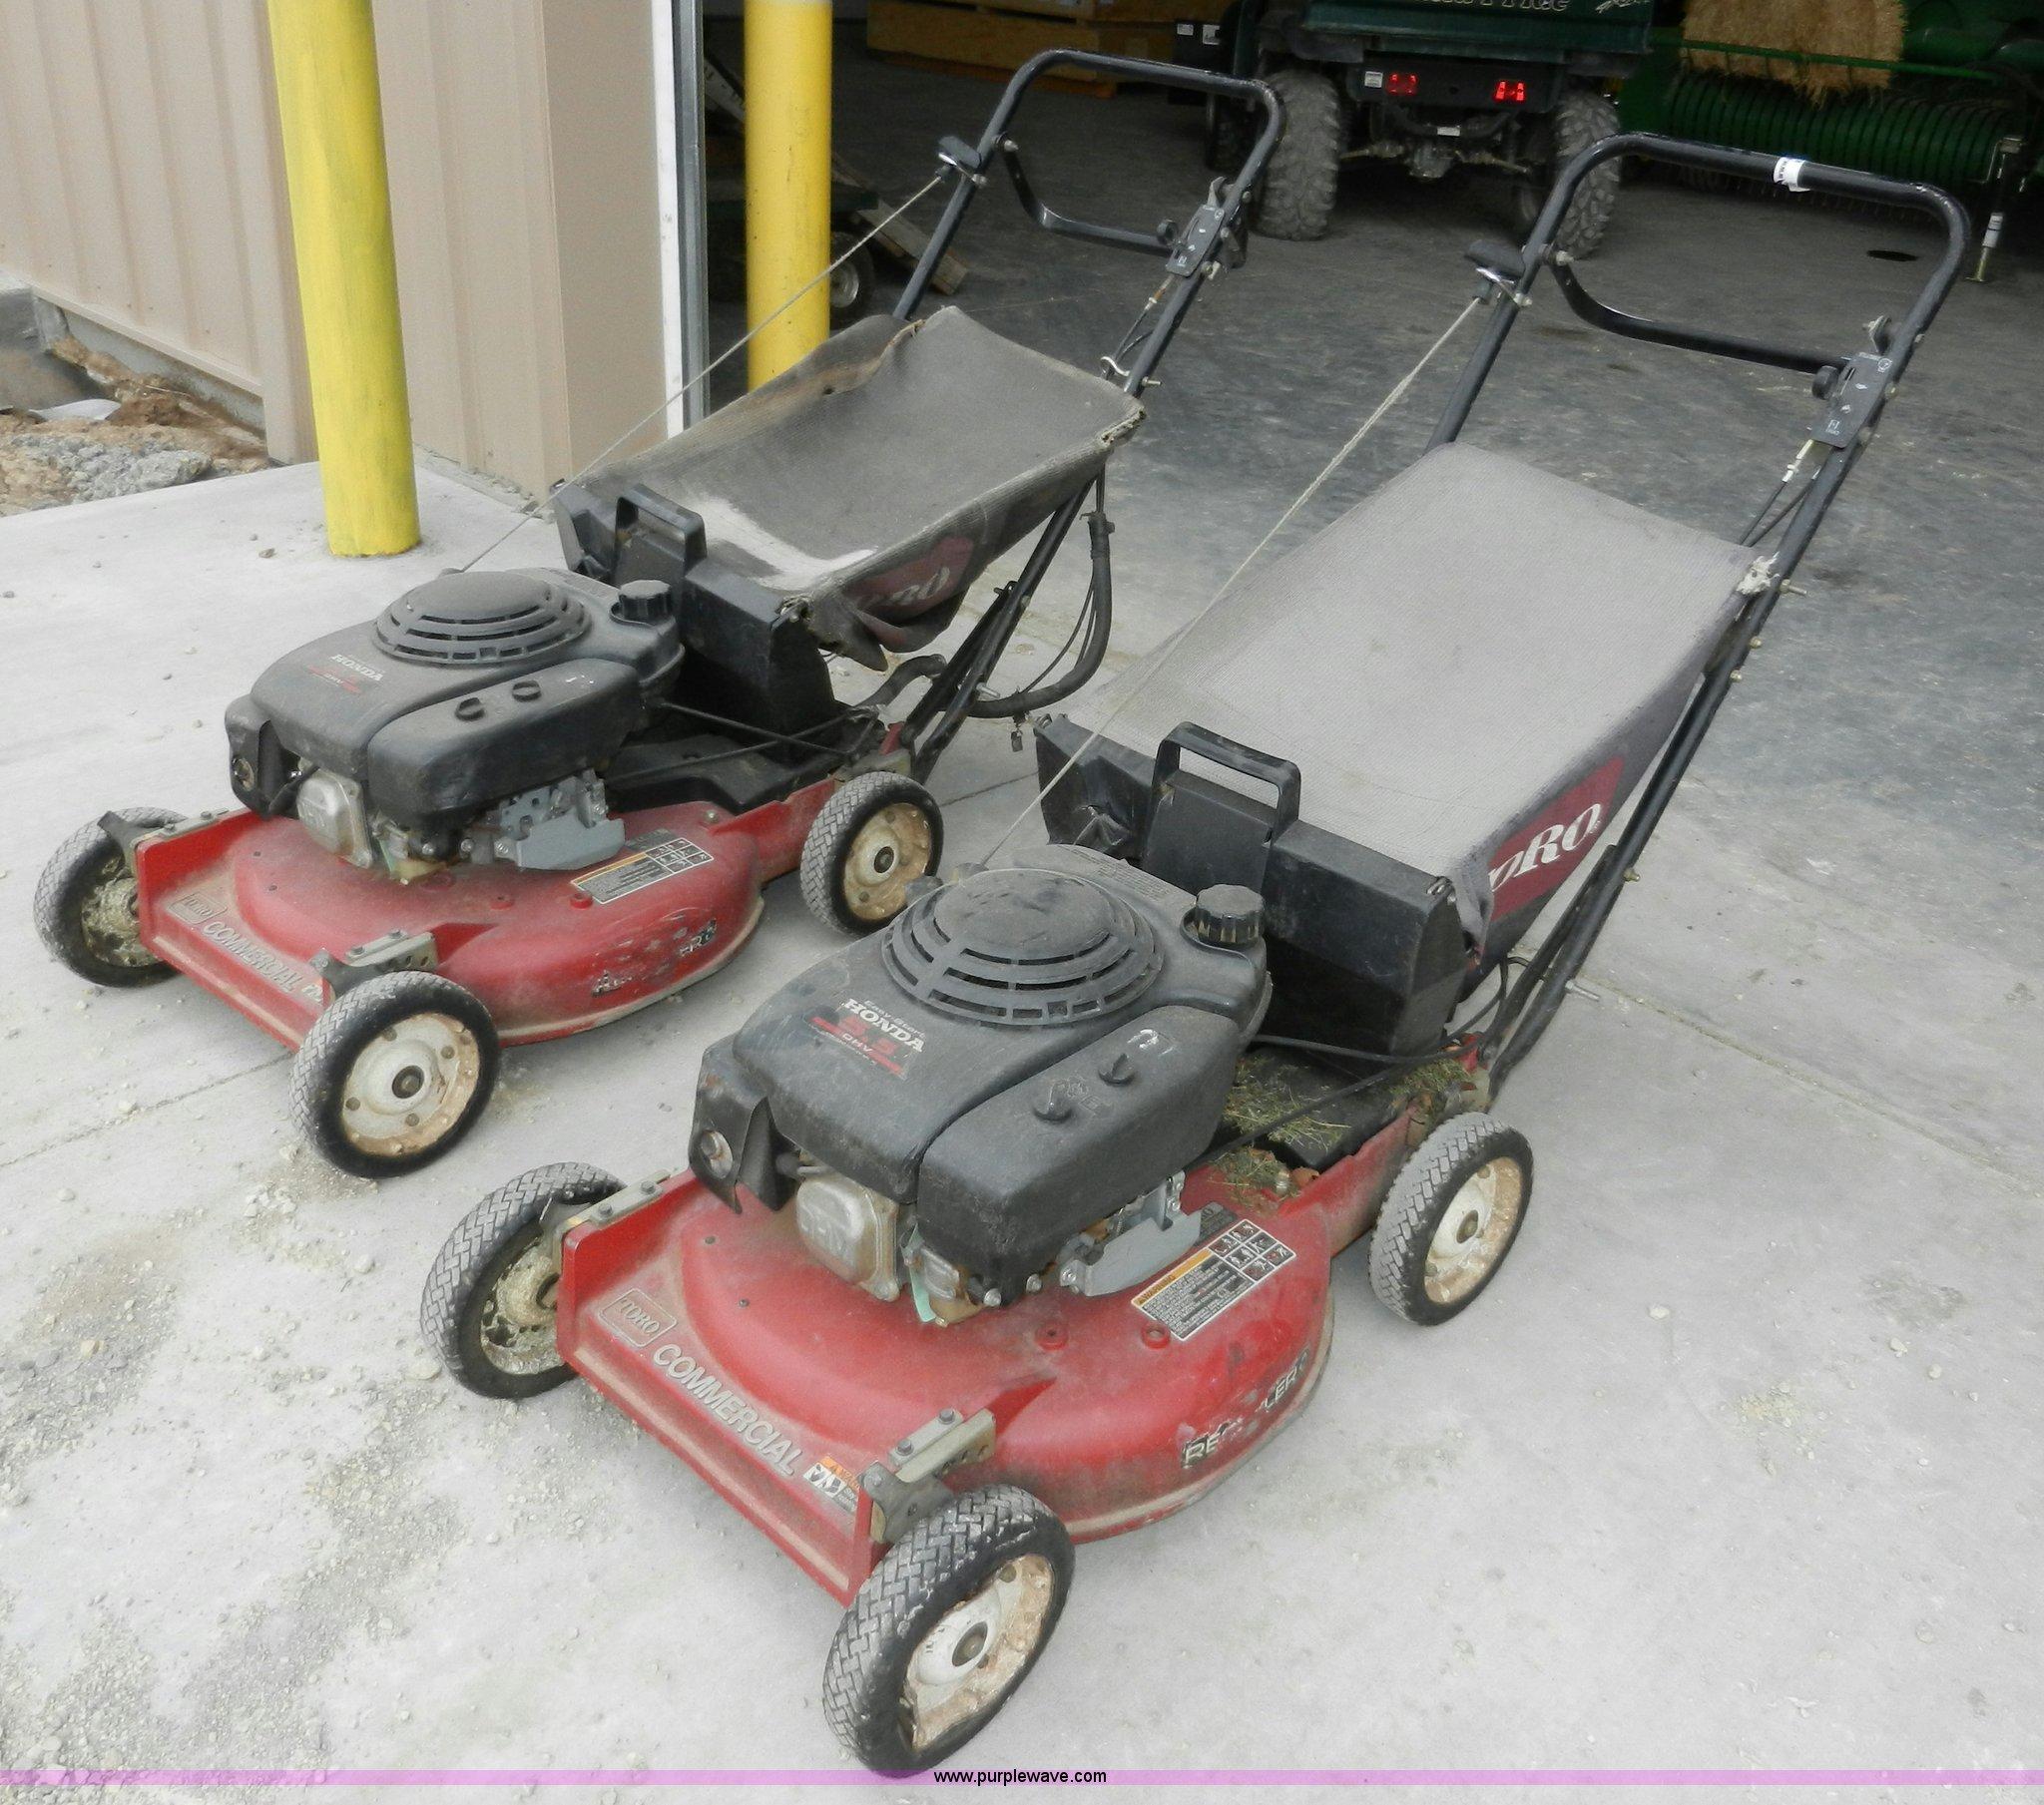 2) Toro commercial push mowers   Item X9610   SOLD! April 1